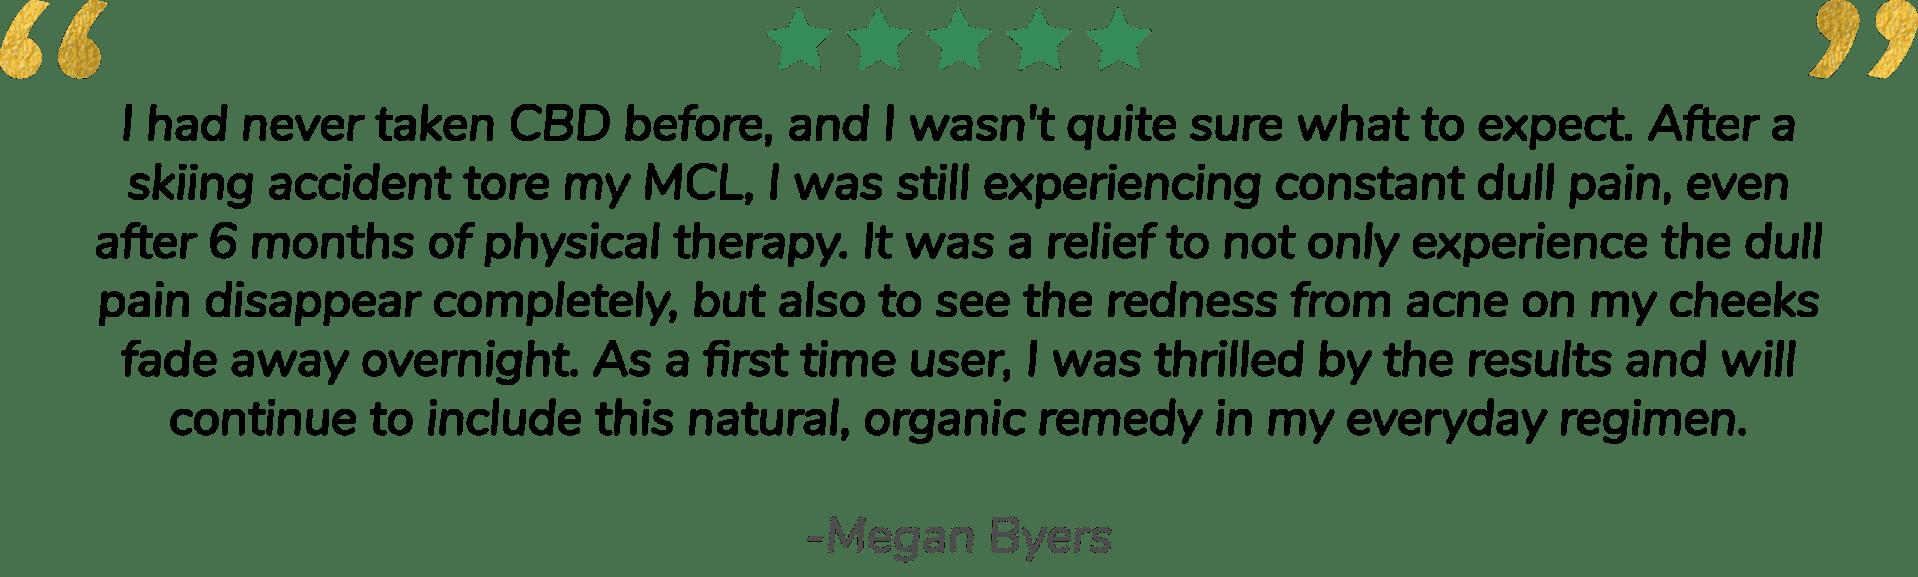 Megan Byers review